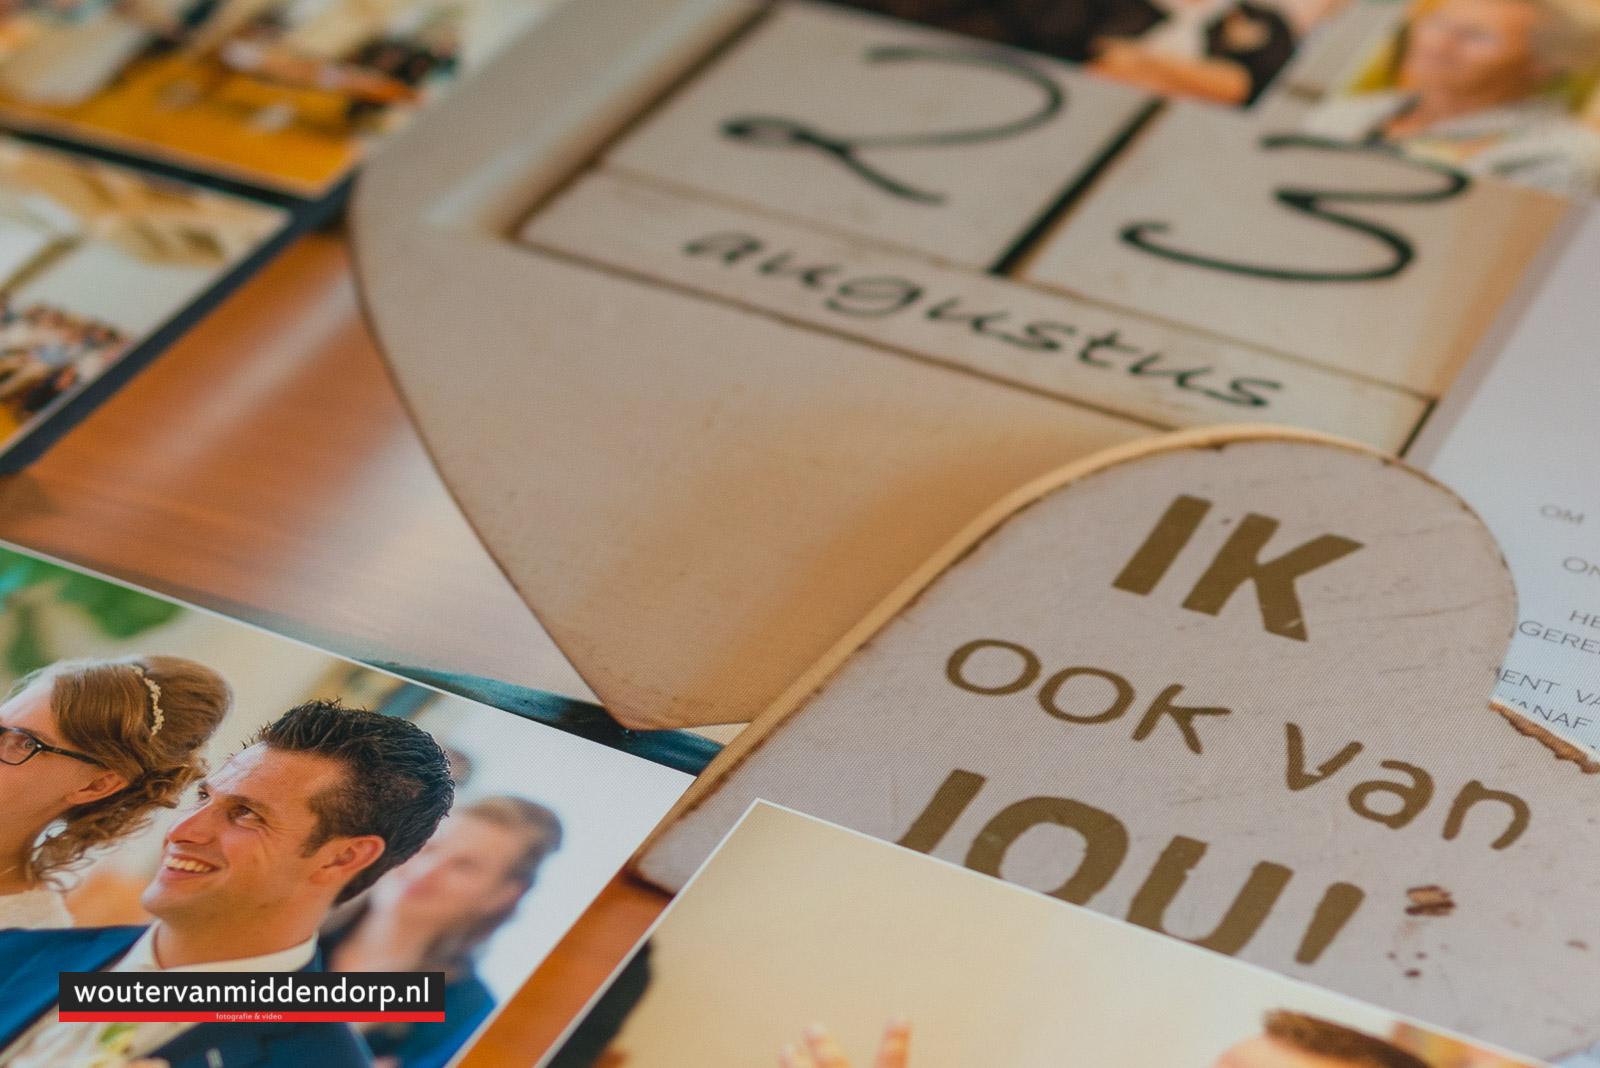 trouwalbum, bruidsreportage, fotograaf Wouter van Middendorp Uddel-16